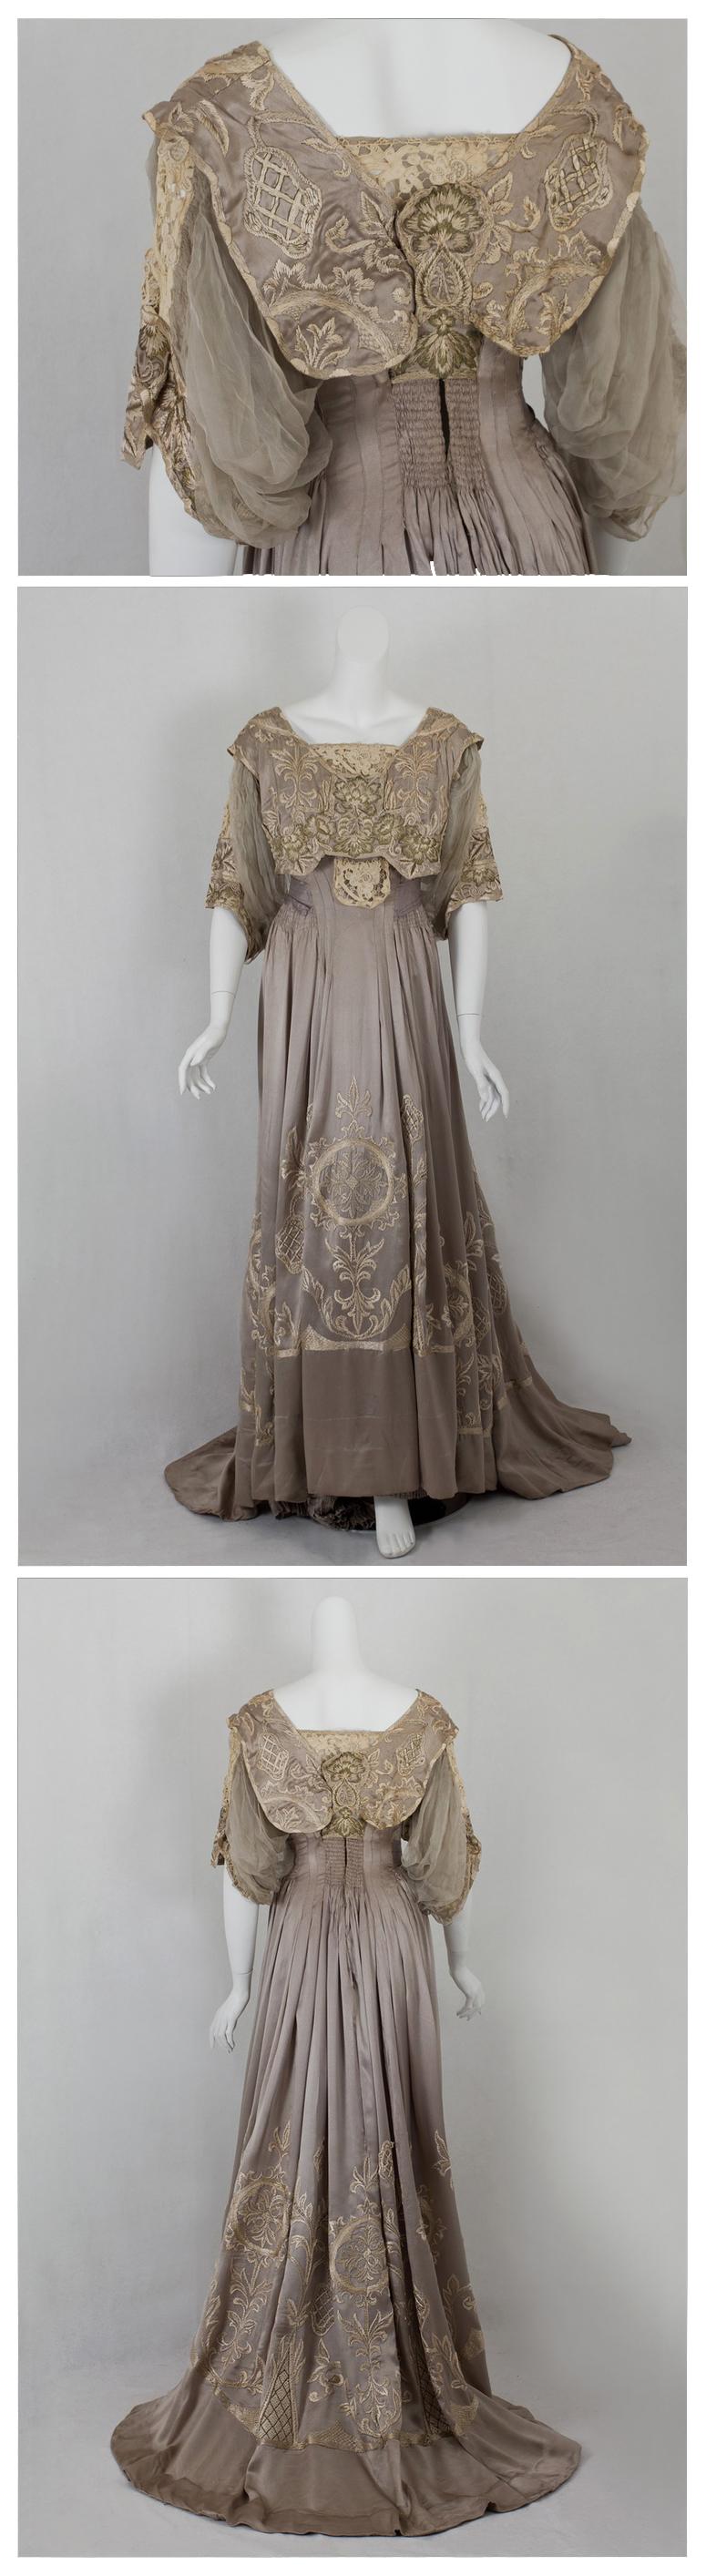 Callot Soeurs dinner dress, c.1905